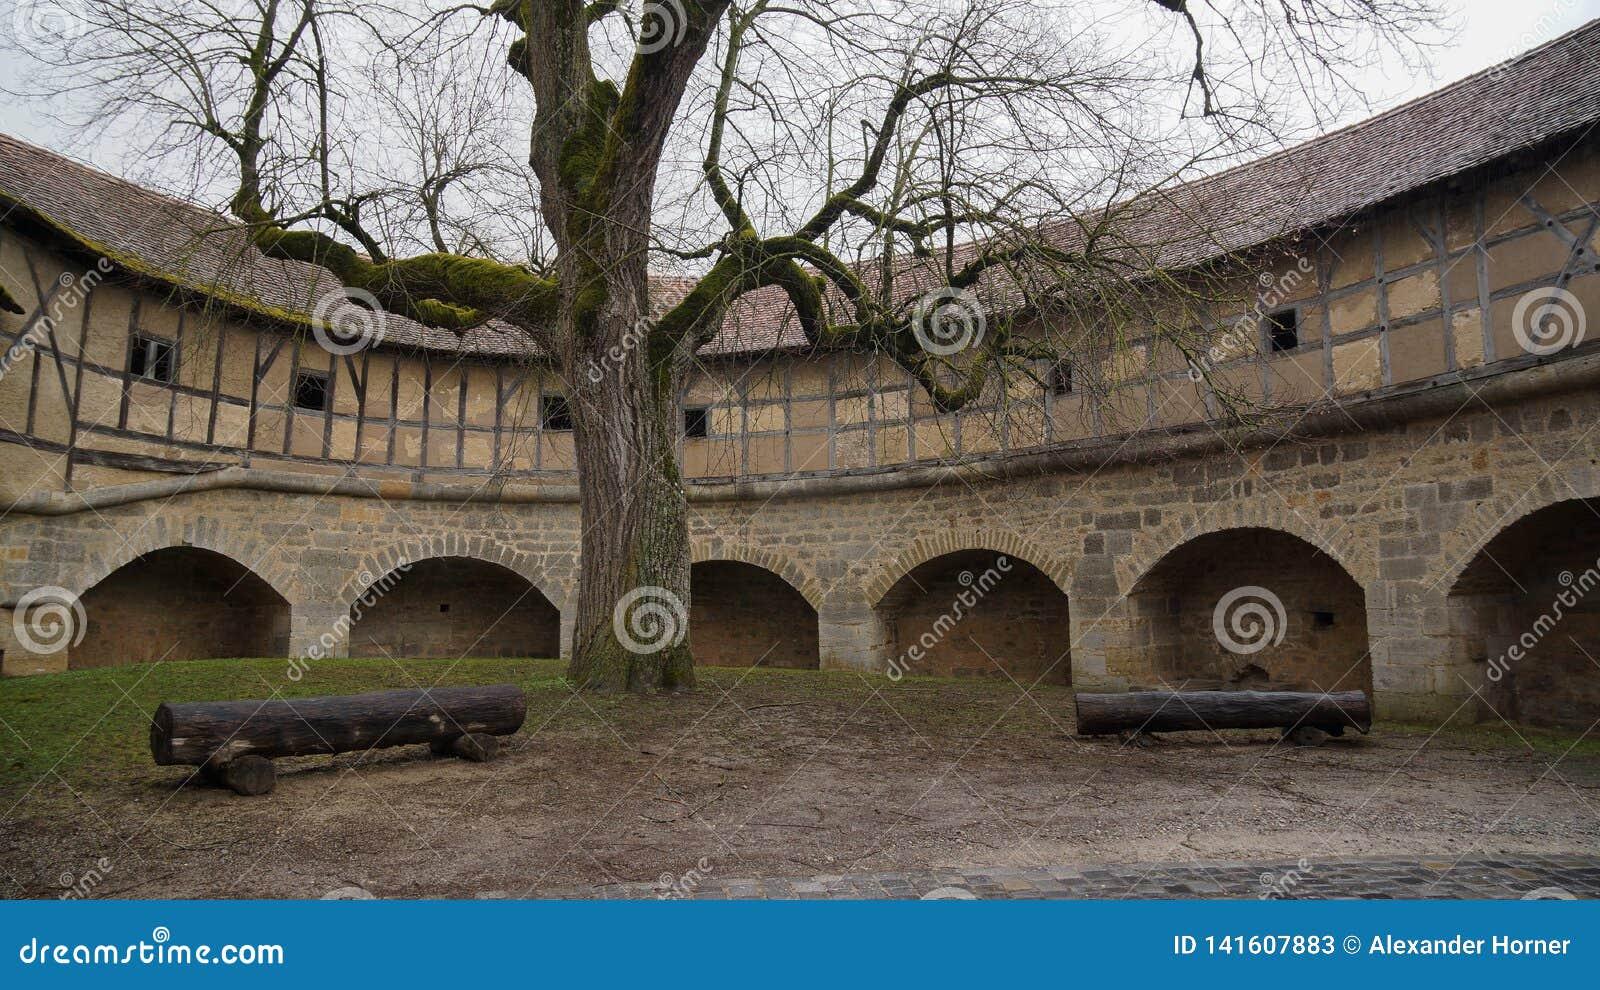 Binnenbinnenplaats met boom en banken